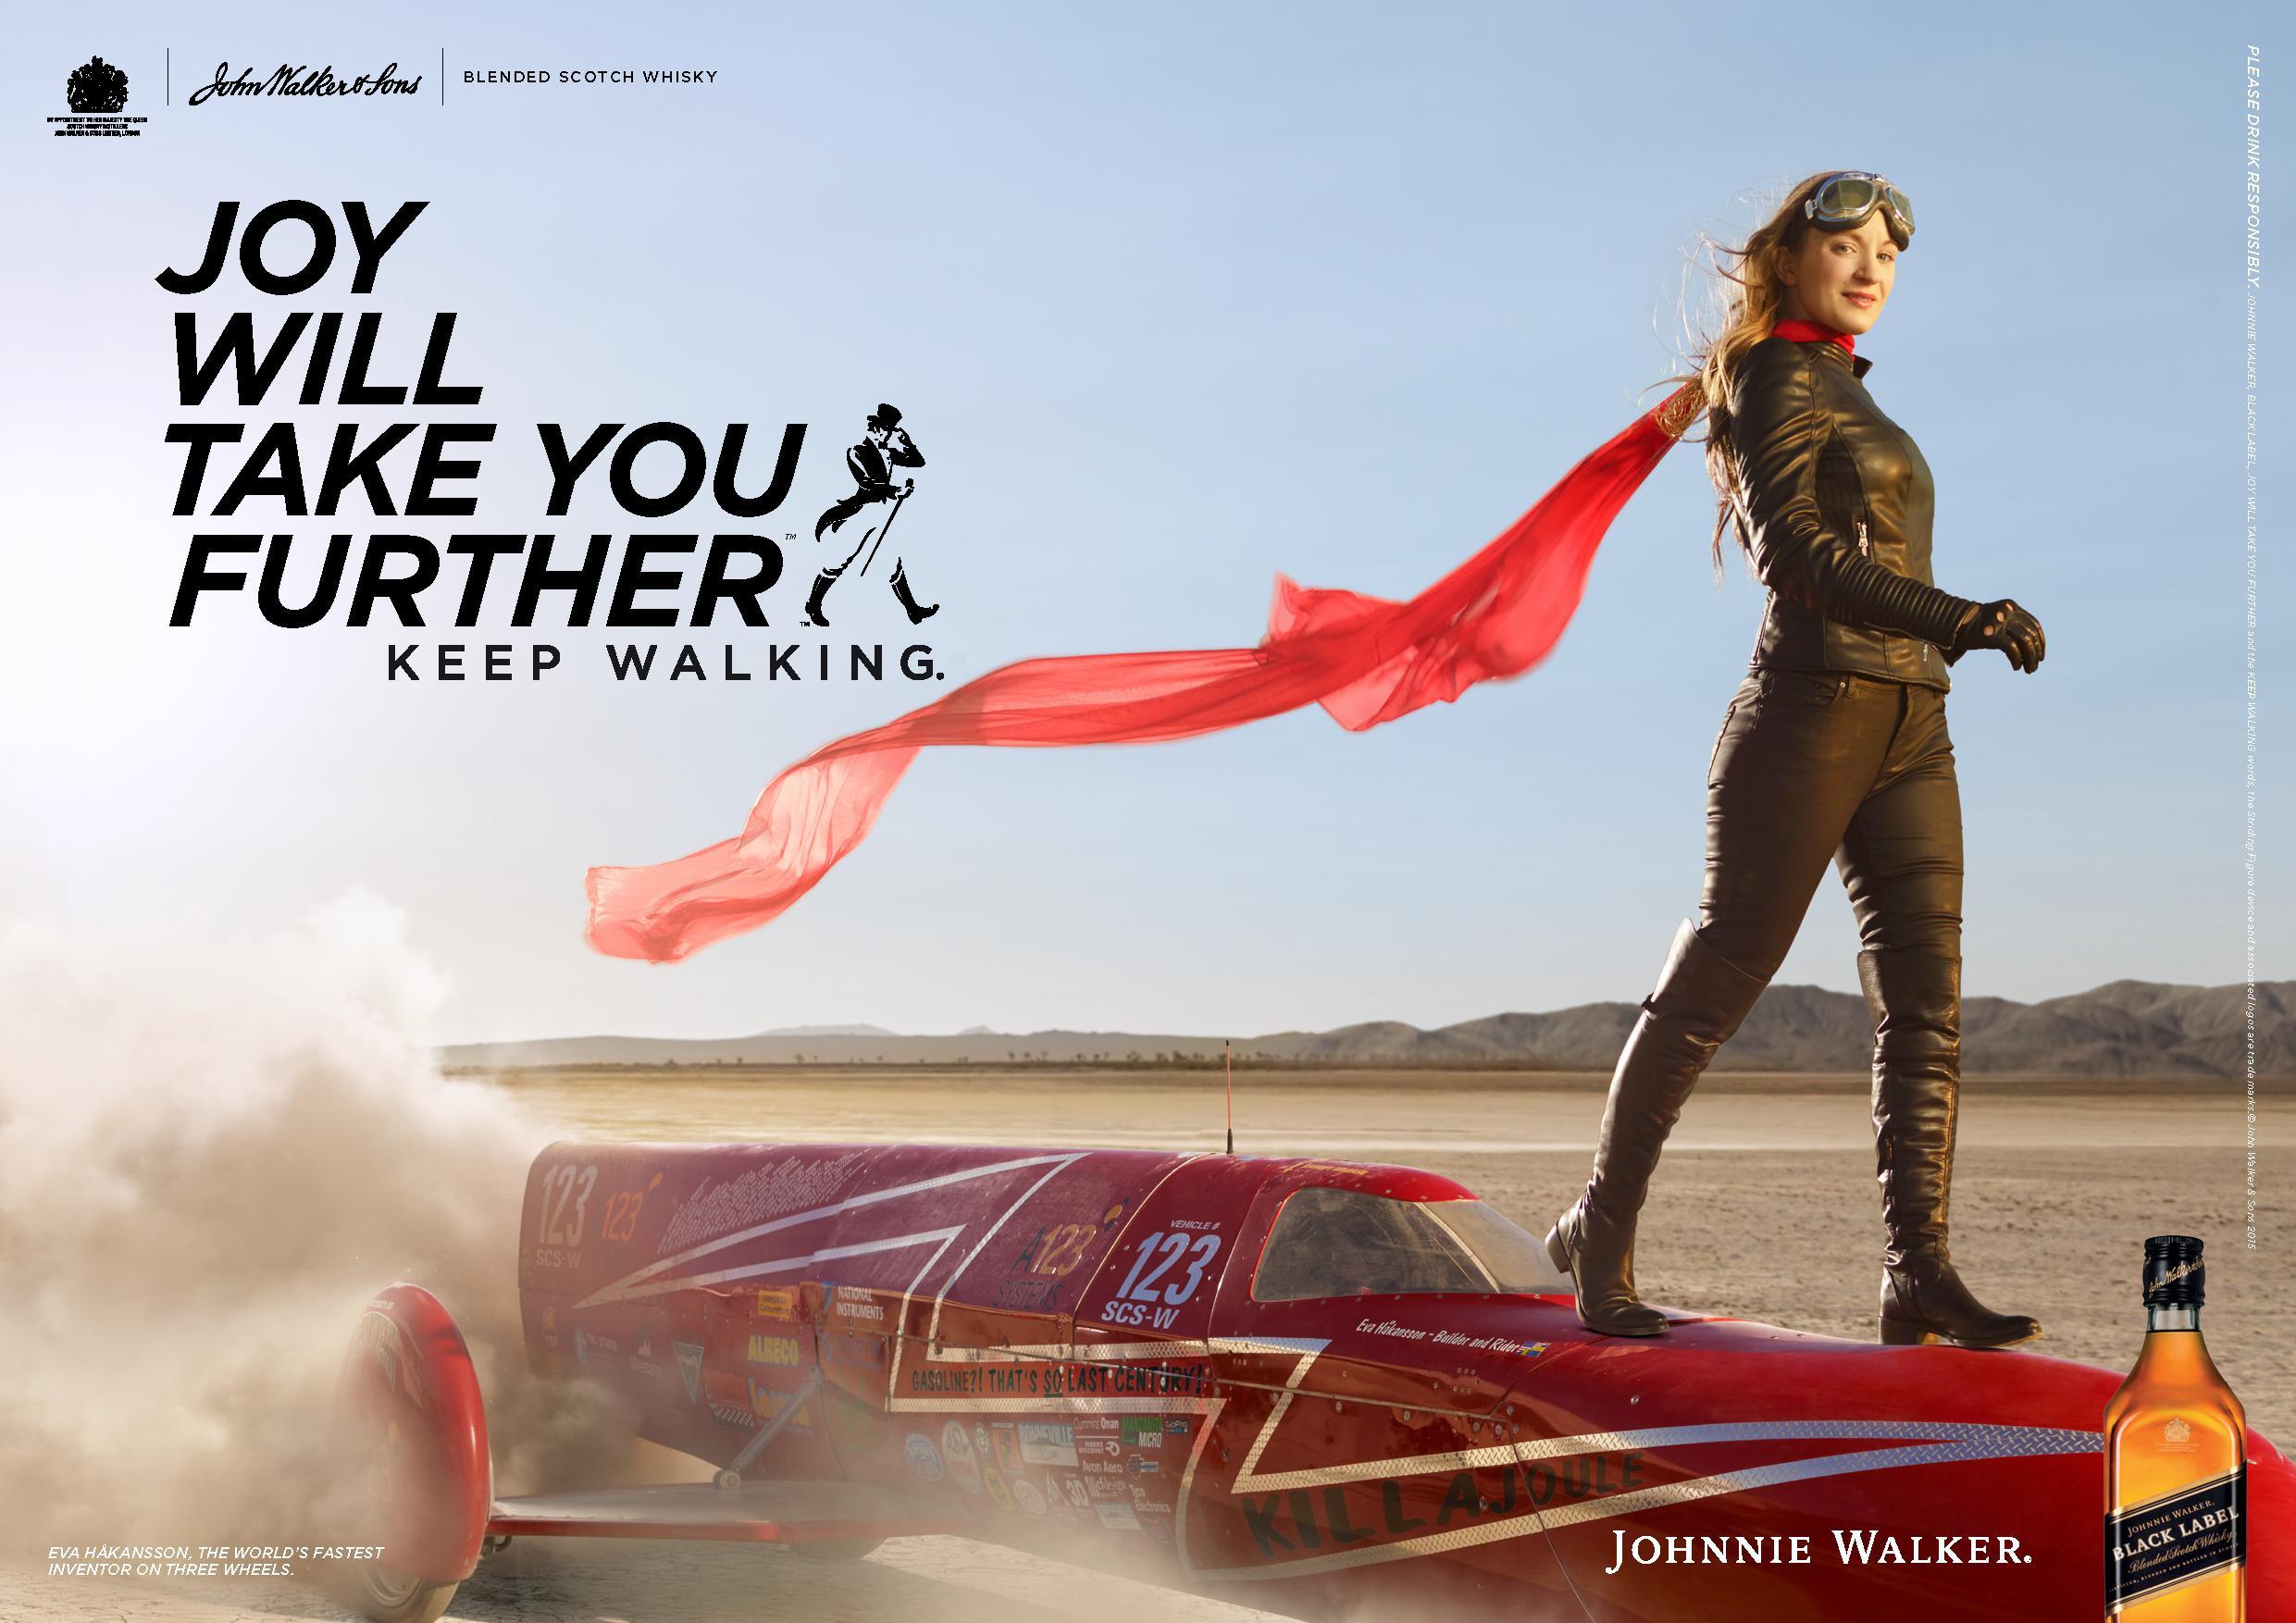 johnnie-walker-joy-will-take-you-further-eva-hakansson_fotor